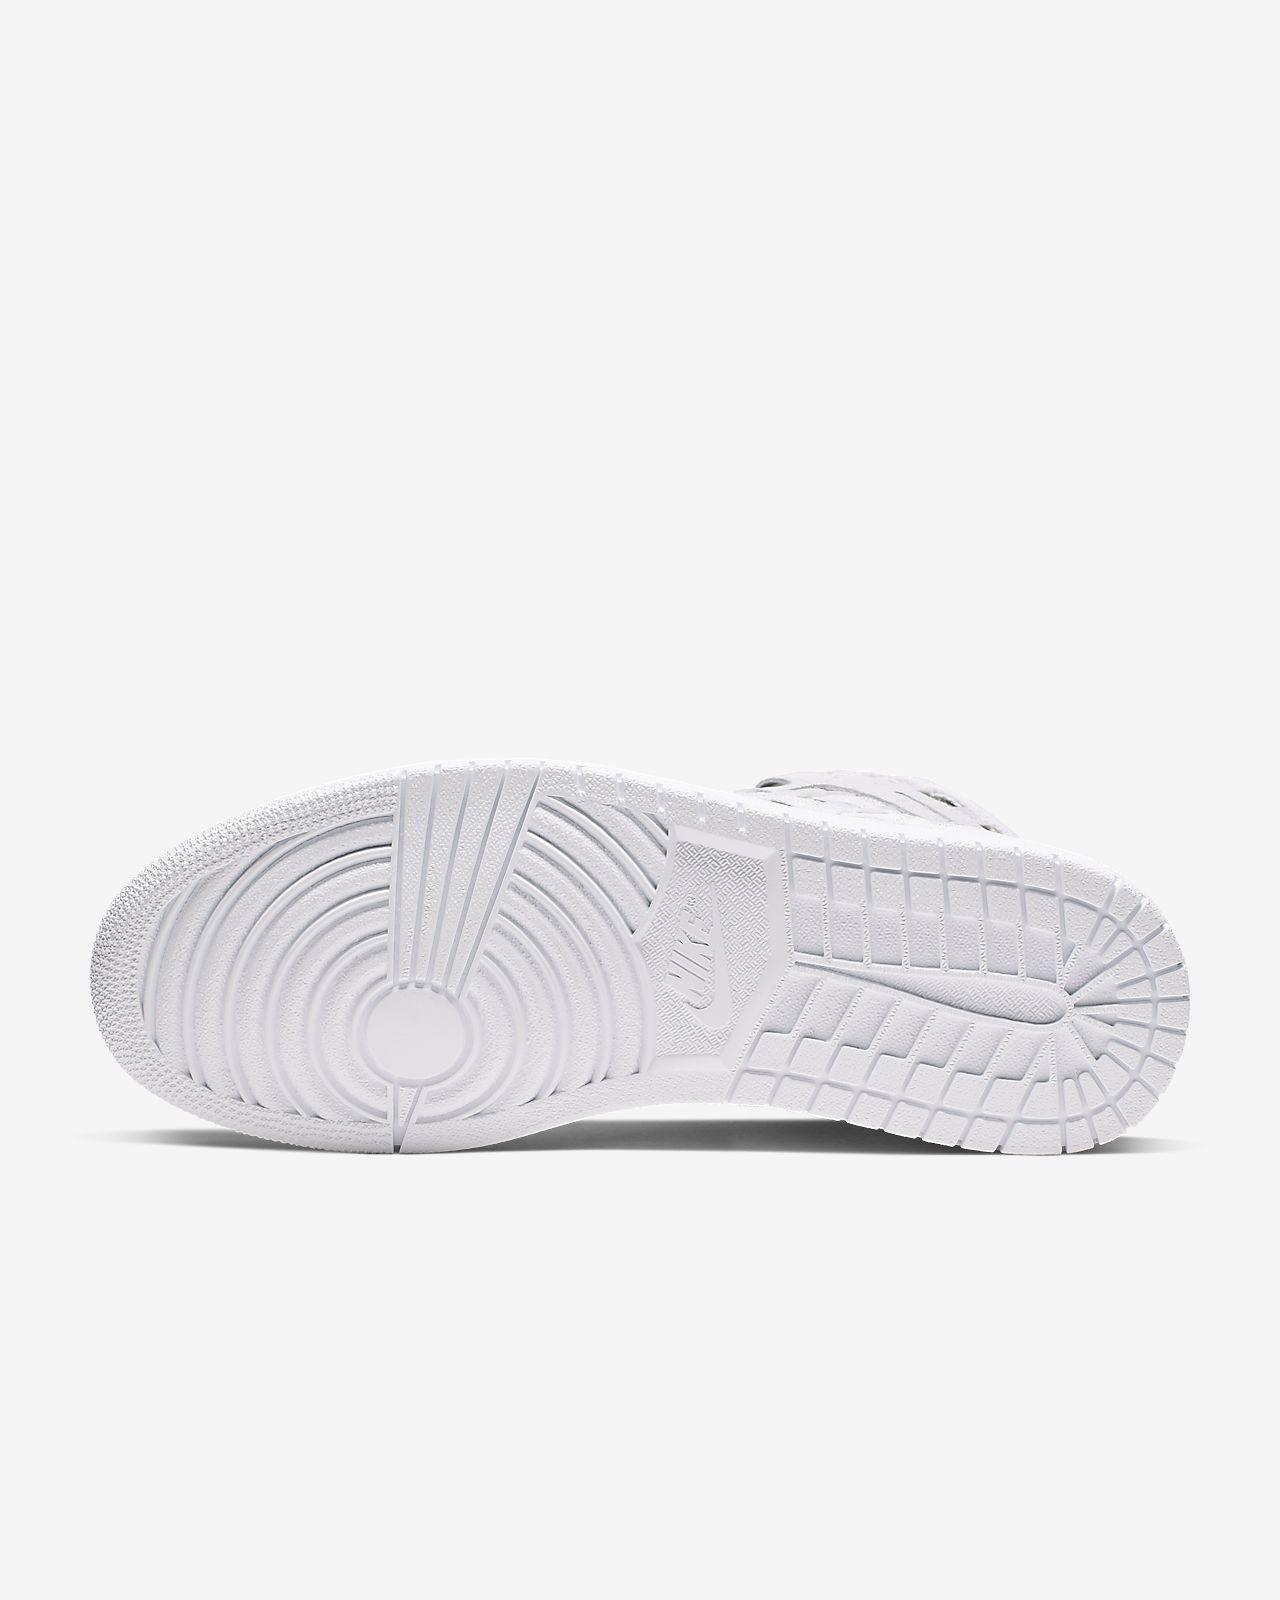 newest collection 420fe f97a4 ... Air Jordan 1 Cargo Men s Shoe